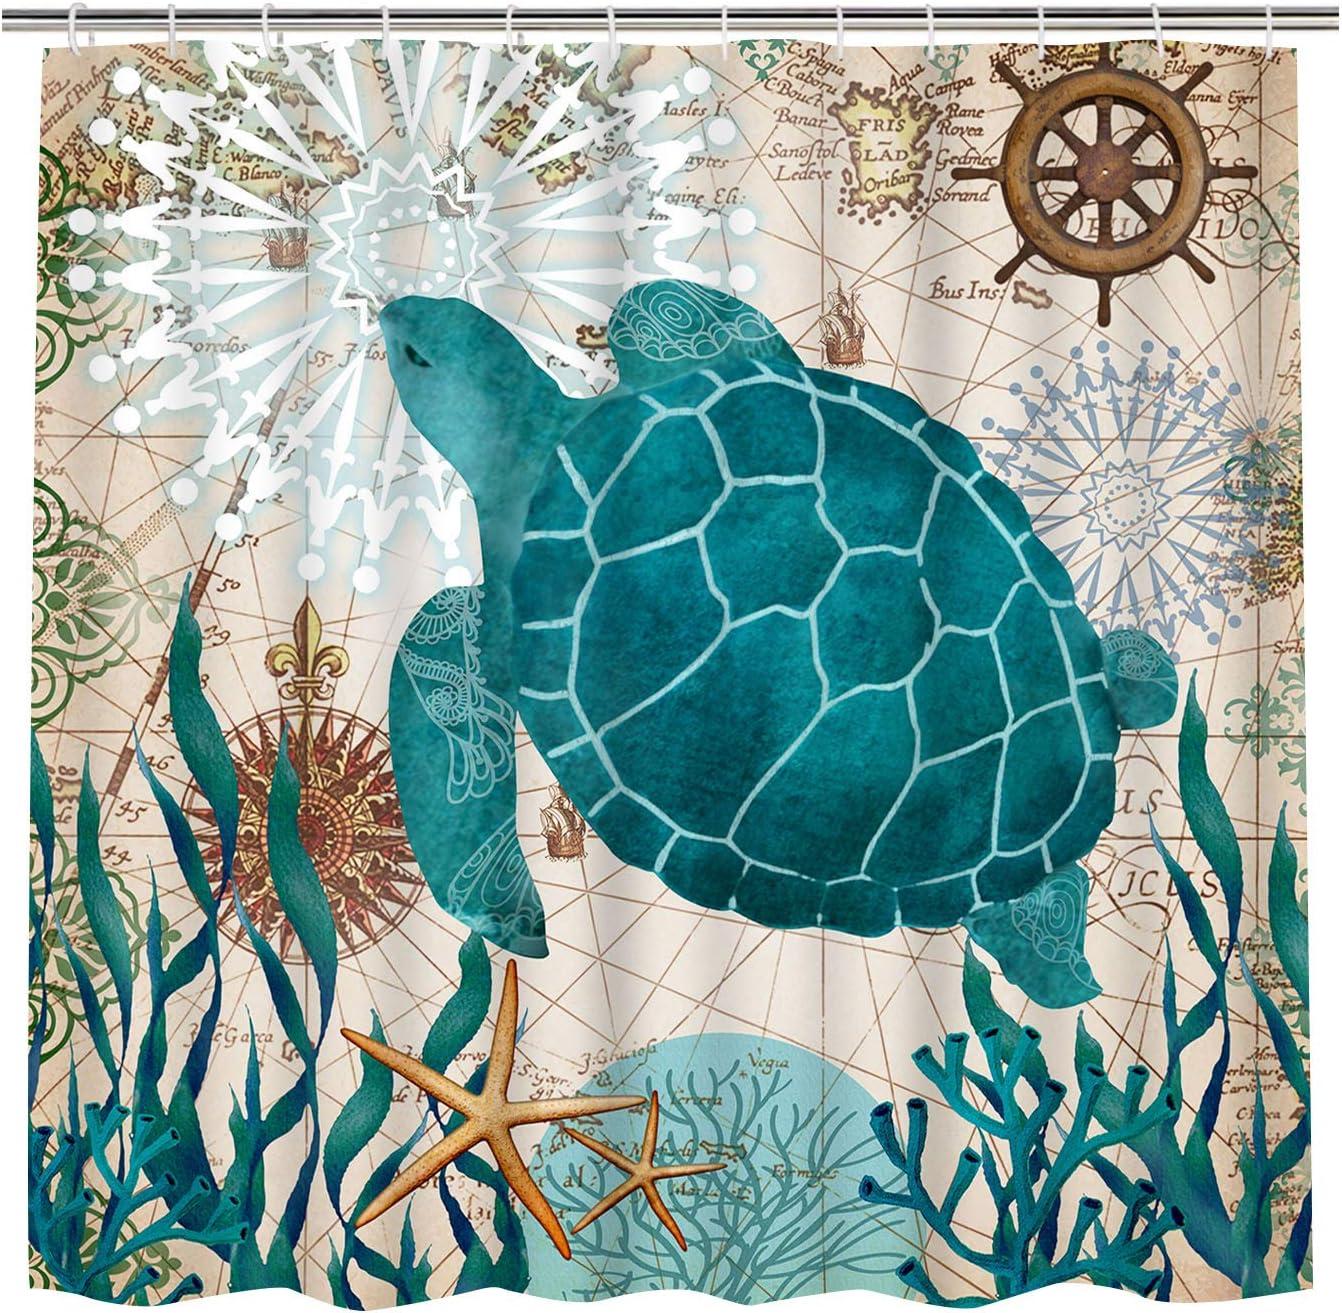 Bathroom Shower Curtain Sea Turtle Ocean Creature Landscape Shower Curtains Fabric Bathroom Curtain Durable Waterproof Bath Curtain Sets With 12 Hooks Kitchen Dining